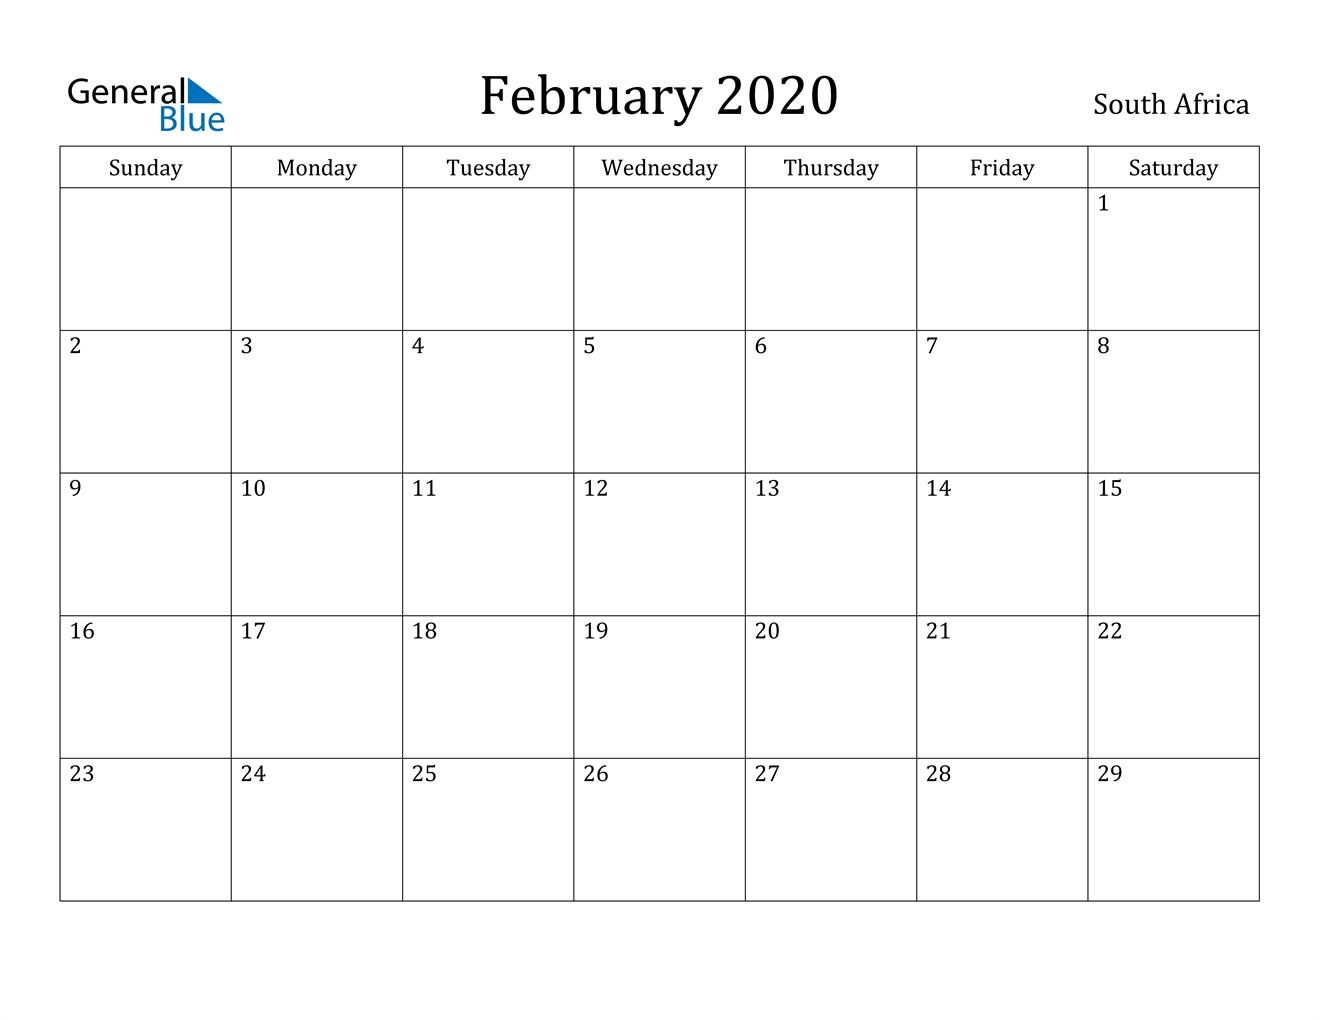 Image of February 2020 South Africa Calendar with Holidays Calendar